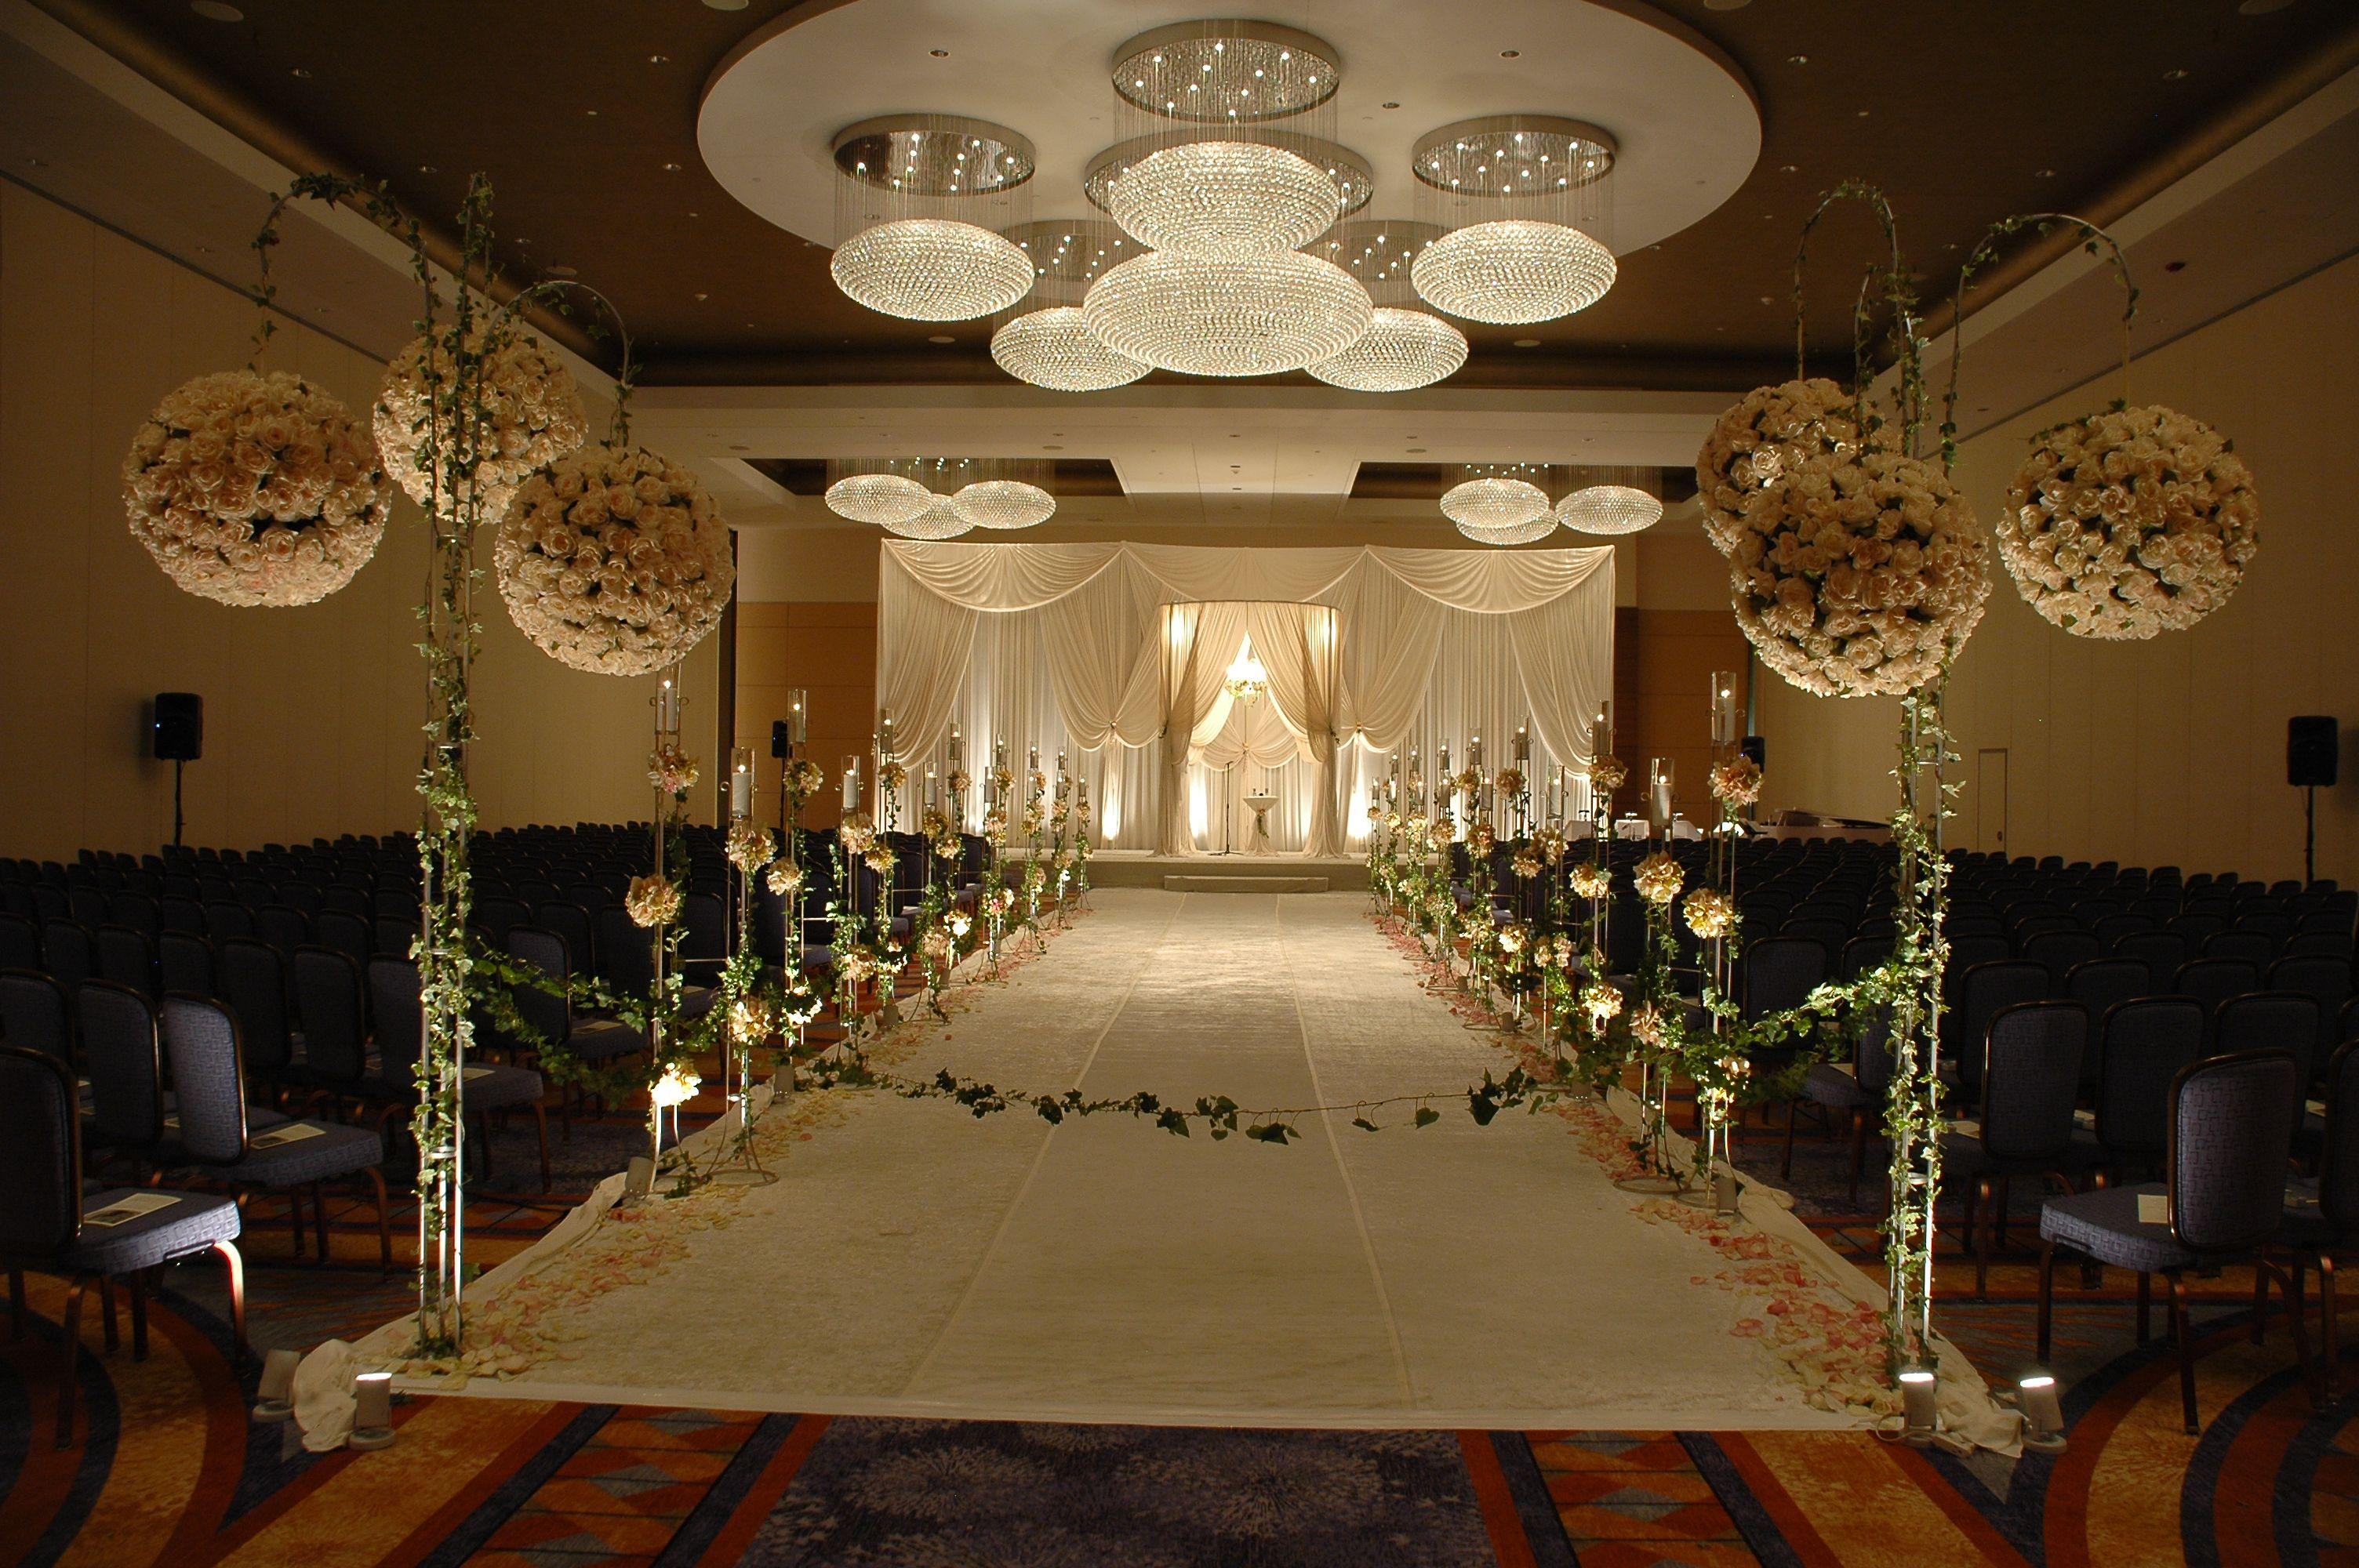 Elegant Wedding Ceremony Decoration Wedding Decoration Ceremony Ros Wedding Decor Elegant Purple Wedding Ceremony Decor Hotel Wedding Ceremony Decorations